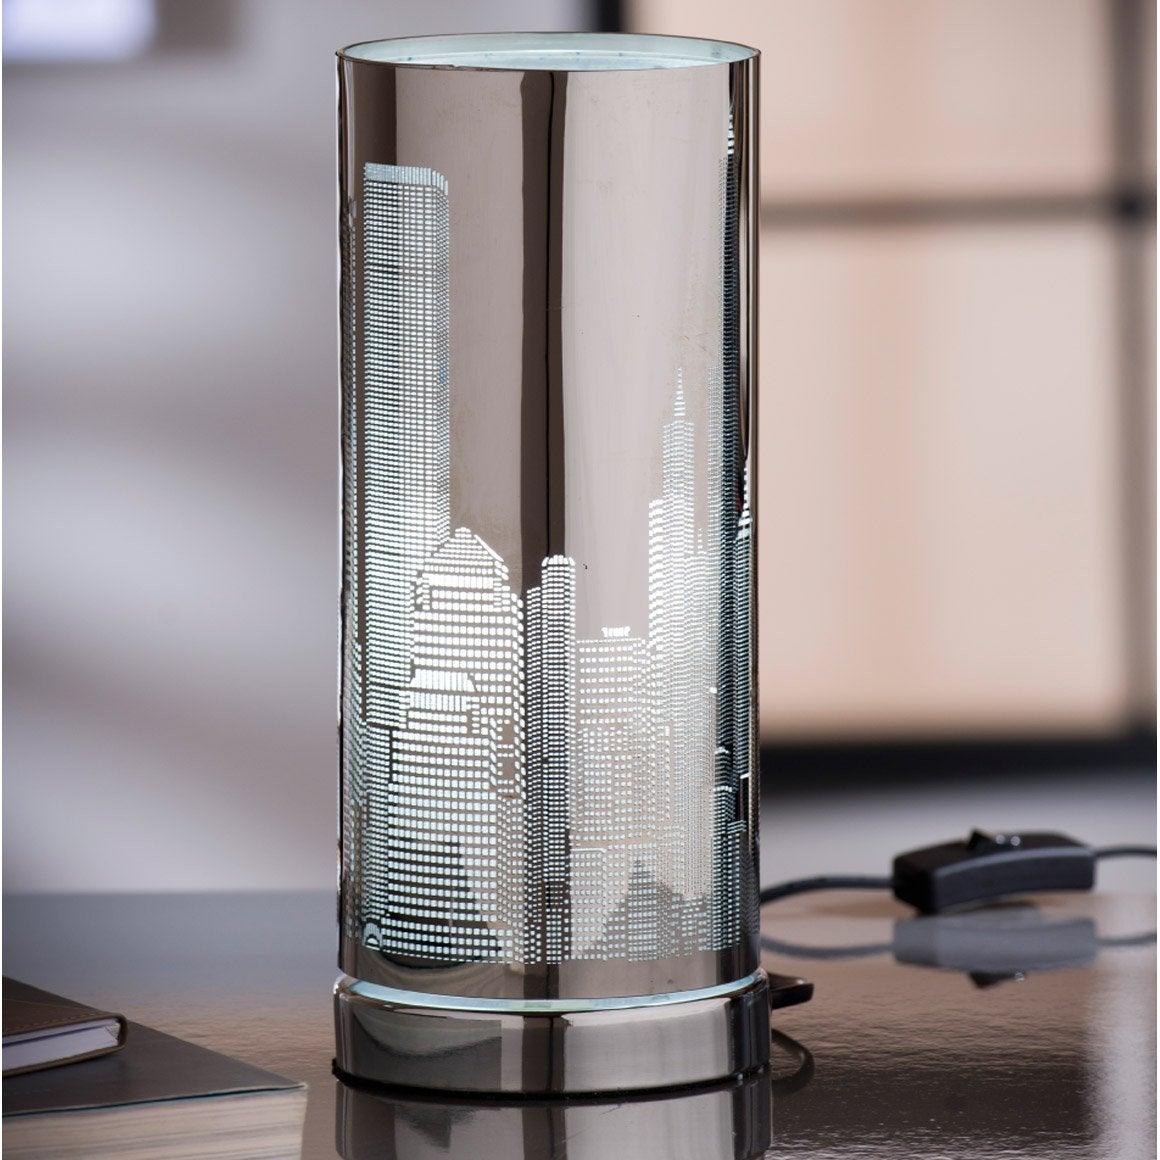 Lampe new york inspire m tal chrome 25w leroy merlin - Lampe a poser leroy merlin ...